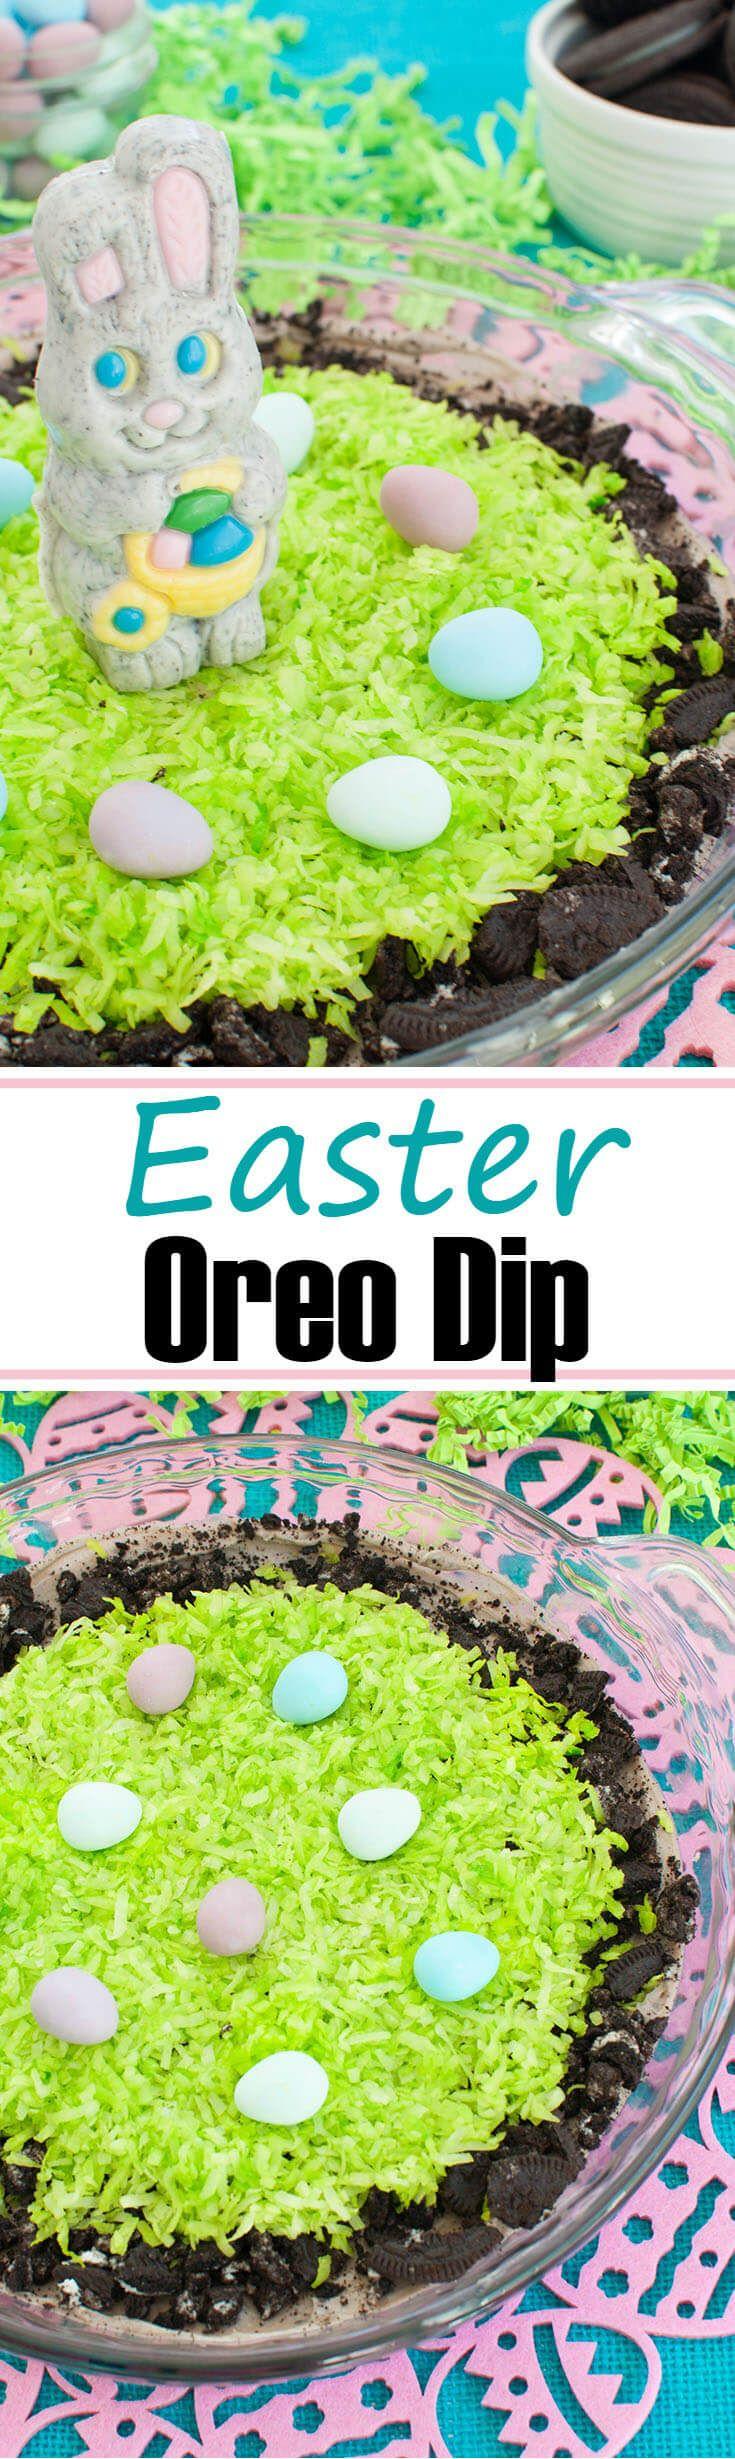 Easter ideas part 3 of 3 real deep stuff - Oreo Dip Creamy Easter Dessert Version